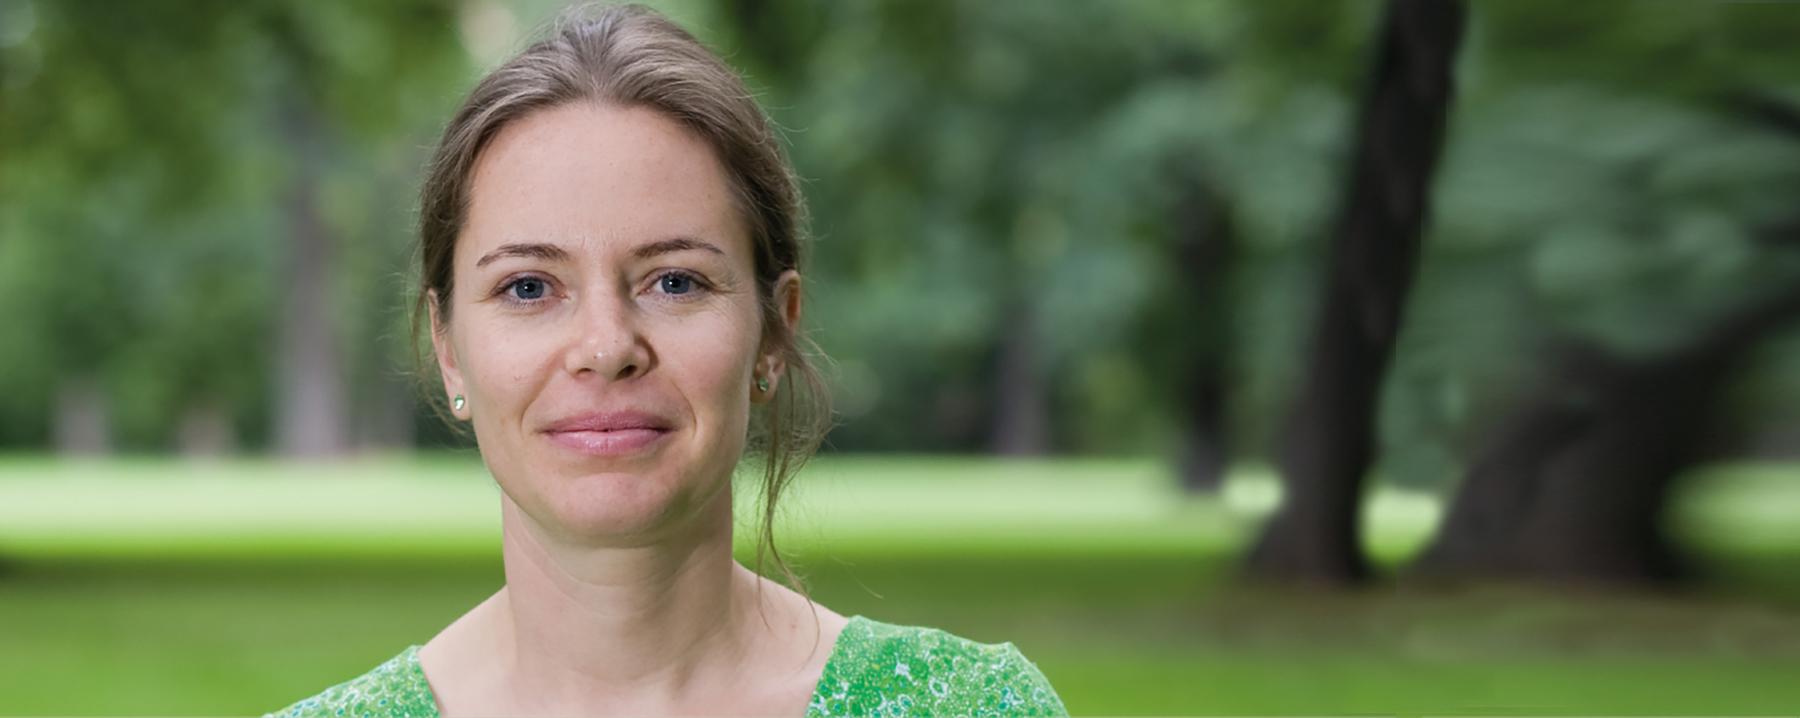 Katrin Rahnefeld - Coaching & Schreibberatung